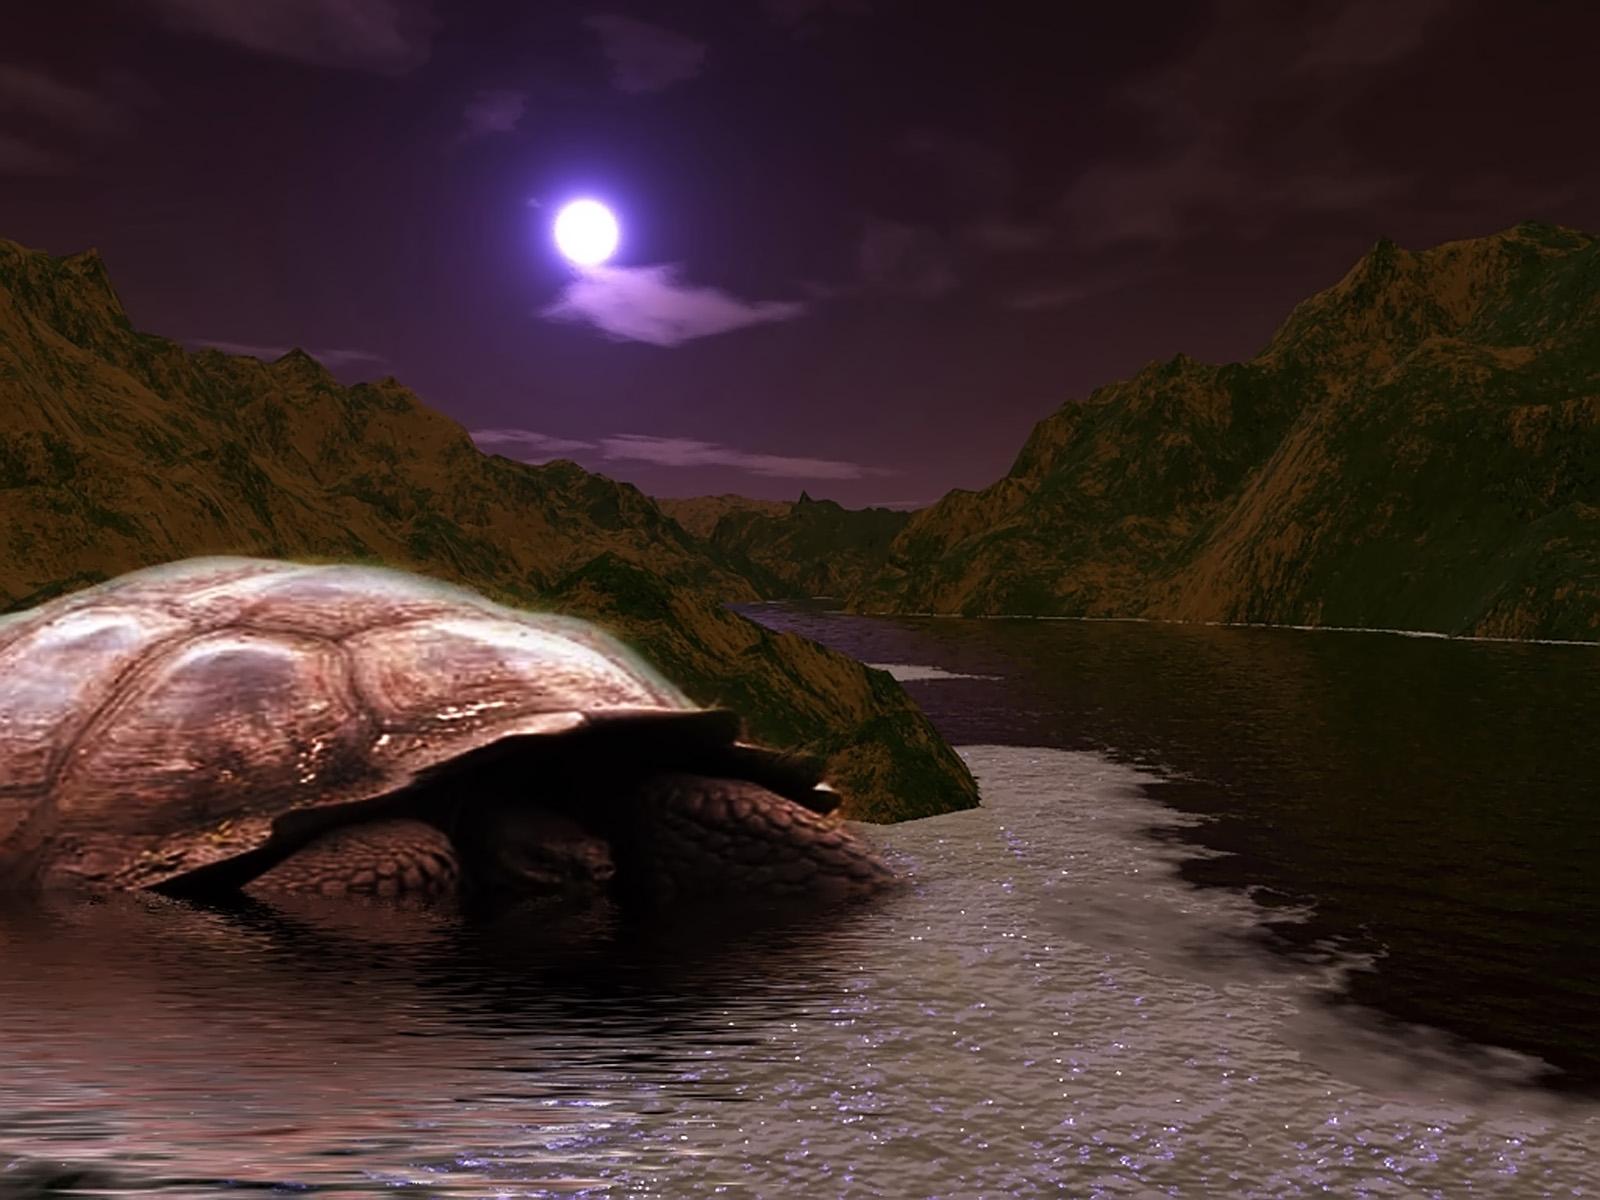 GIANT TURTLE, 3d, Bspo06, Dark, Landscape, HQ Photo